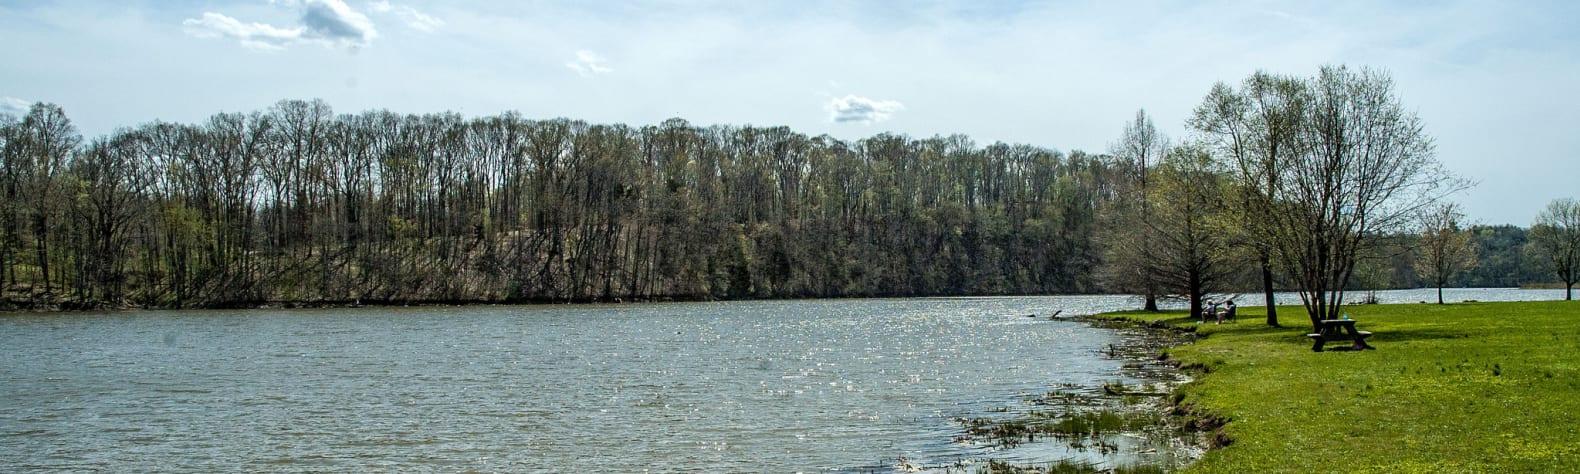 Versailles State Park